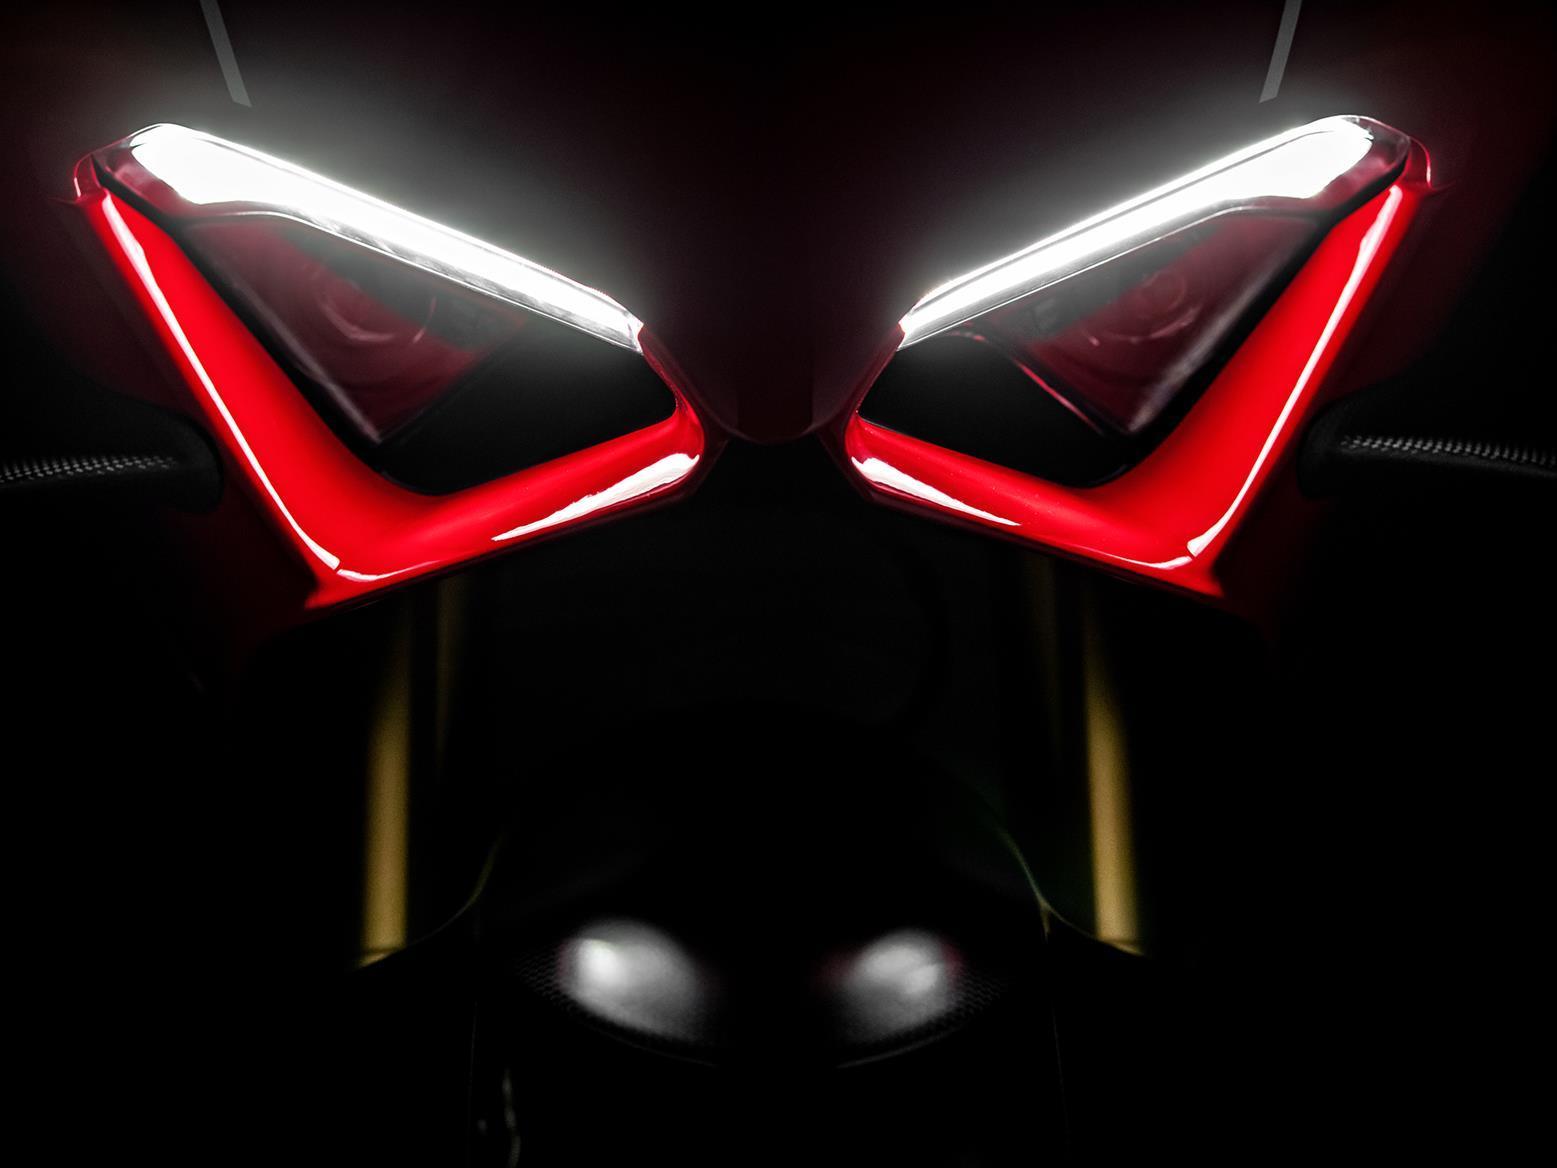 Ducati Panigale V4 R headlight